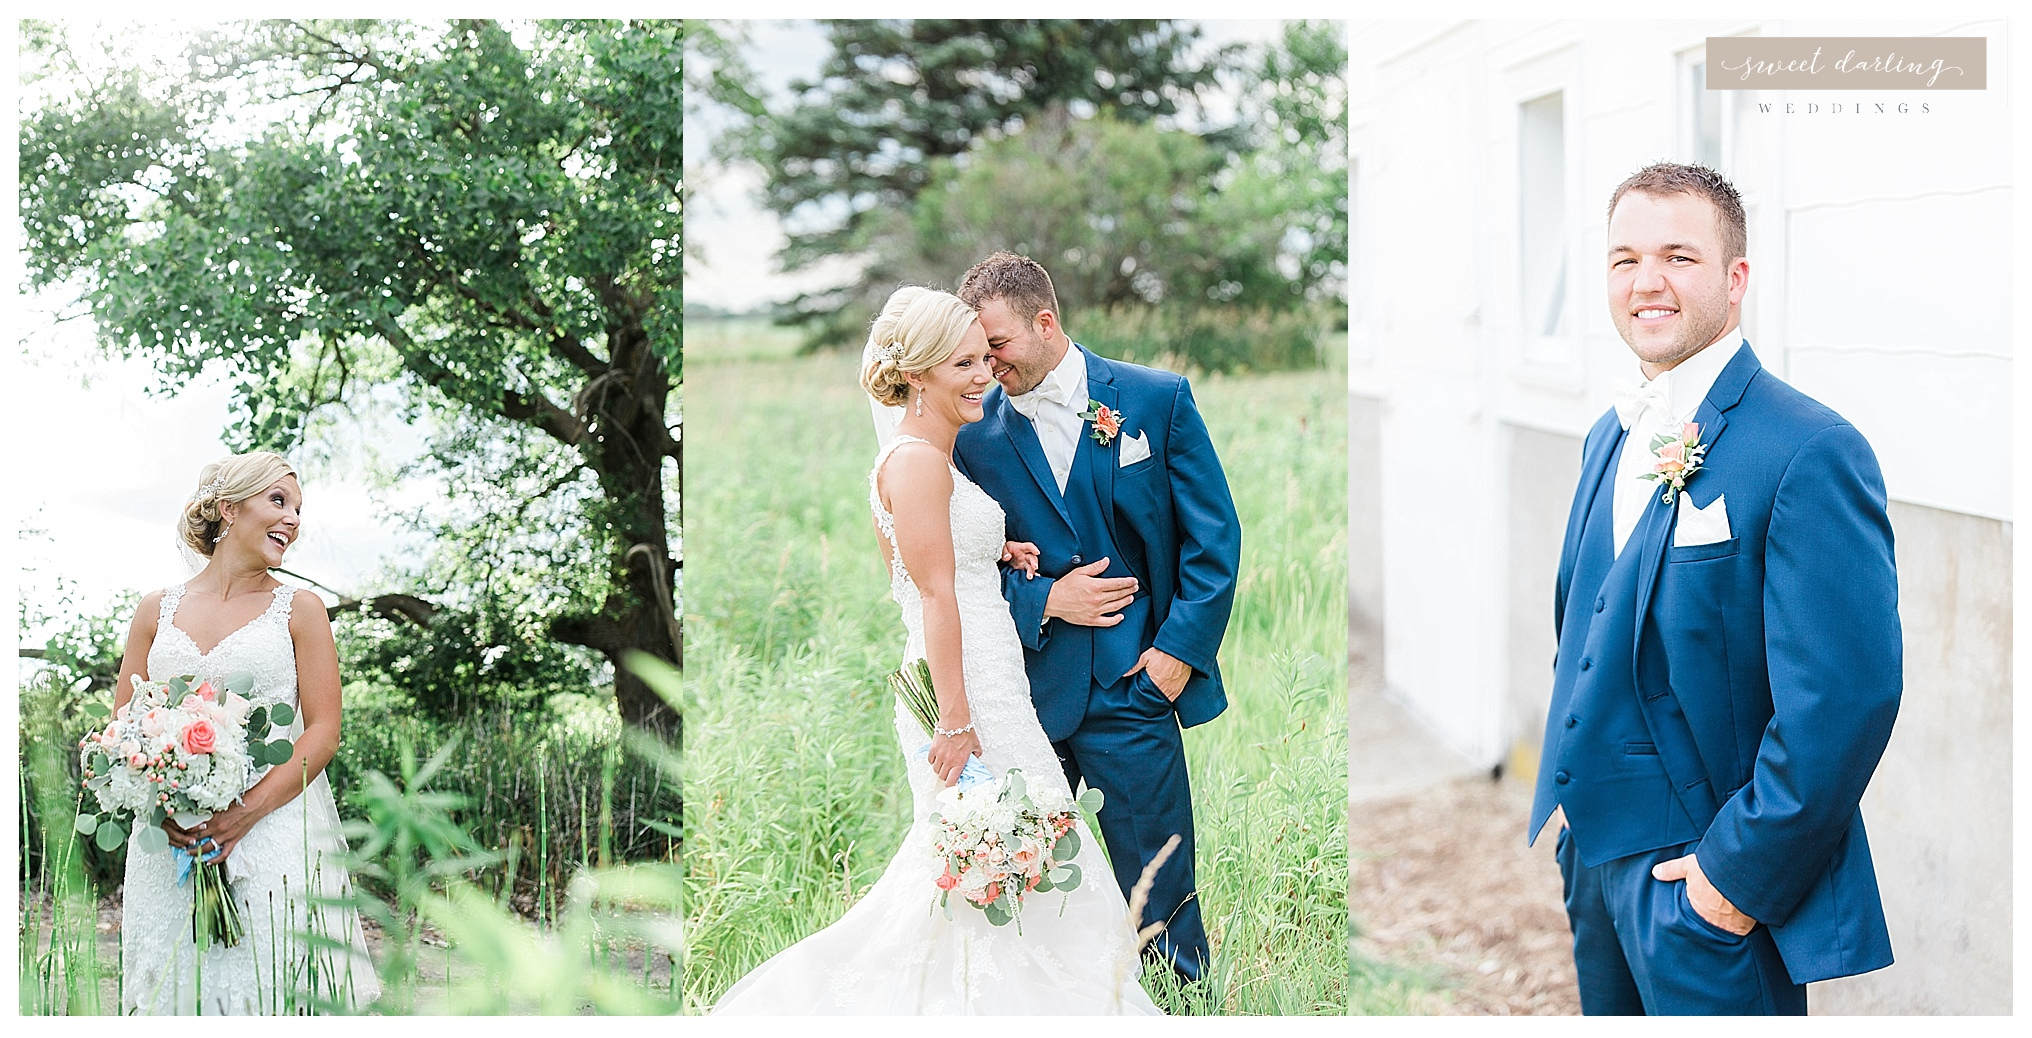 Paxton-illinois-engelbrecht-farmstead-romantic-wedding-photographer-sweet-darling-weddings_1238.jpg